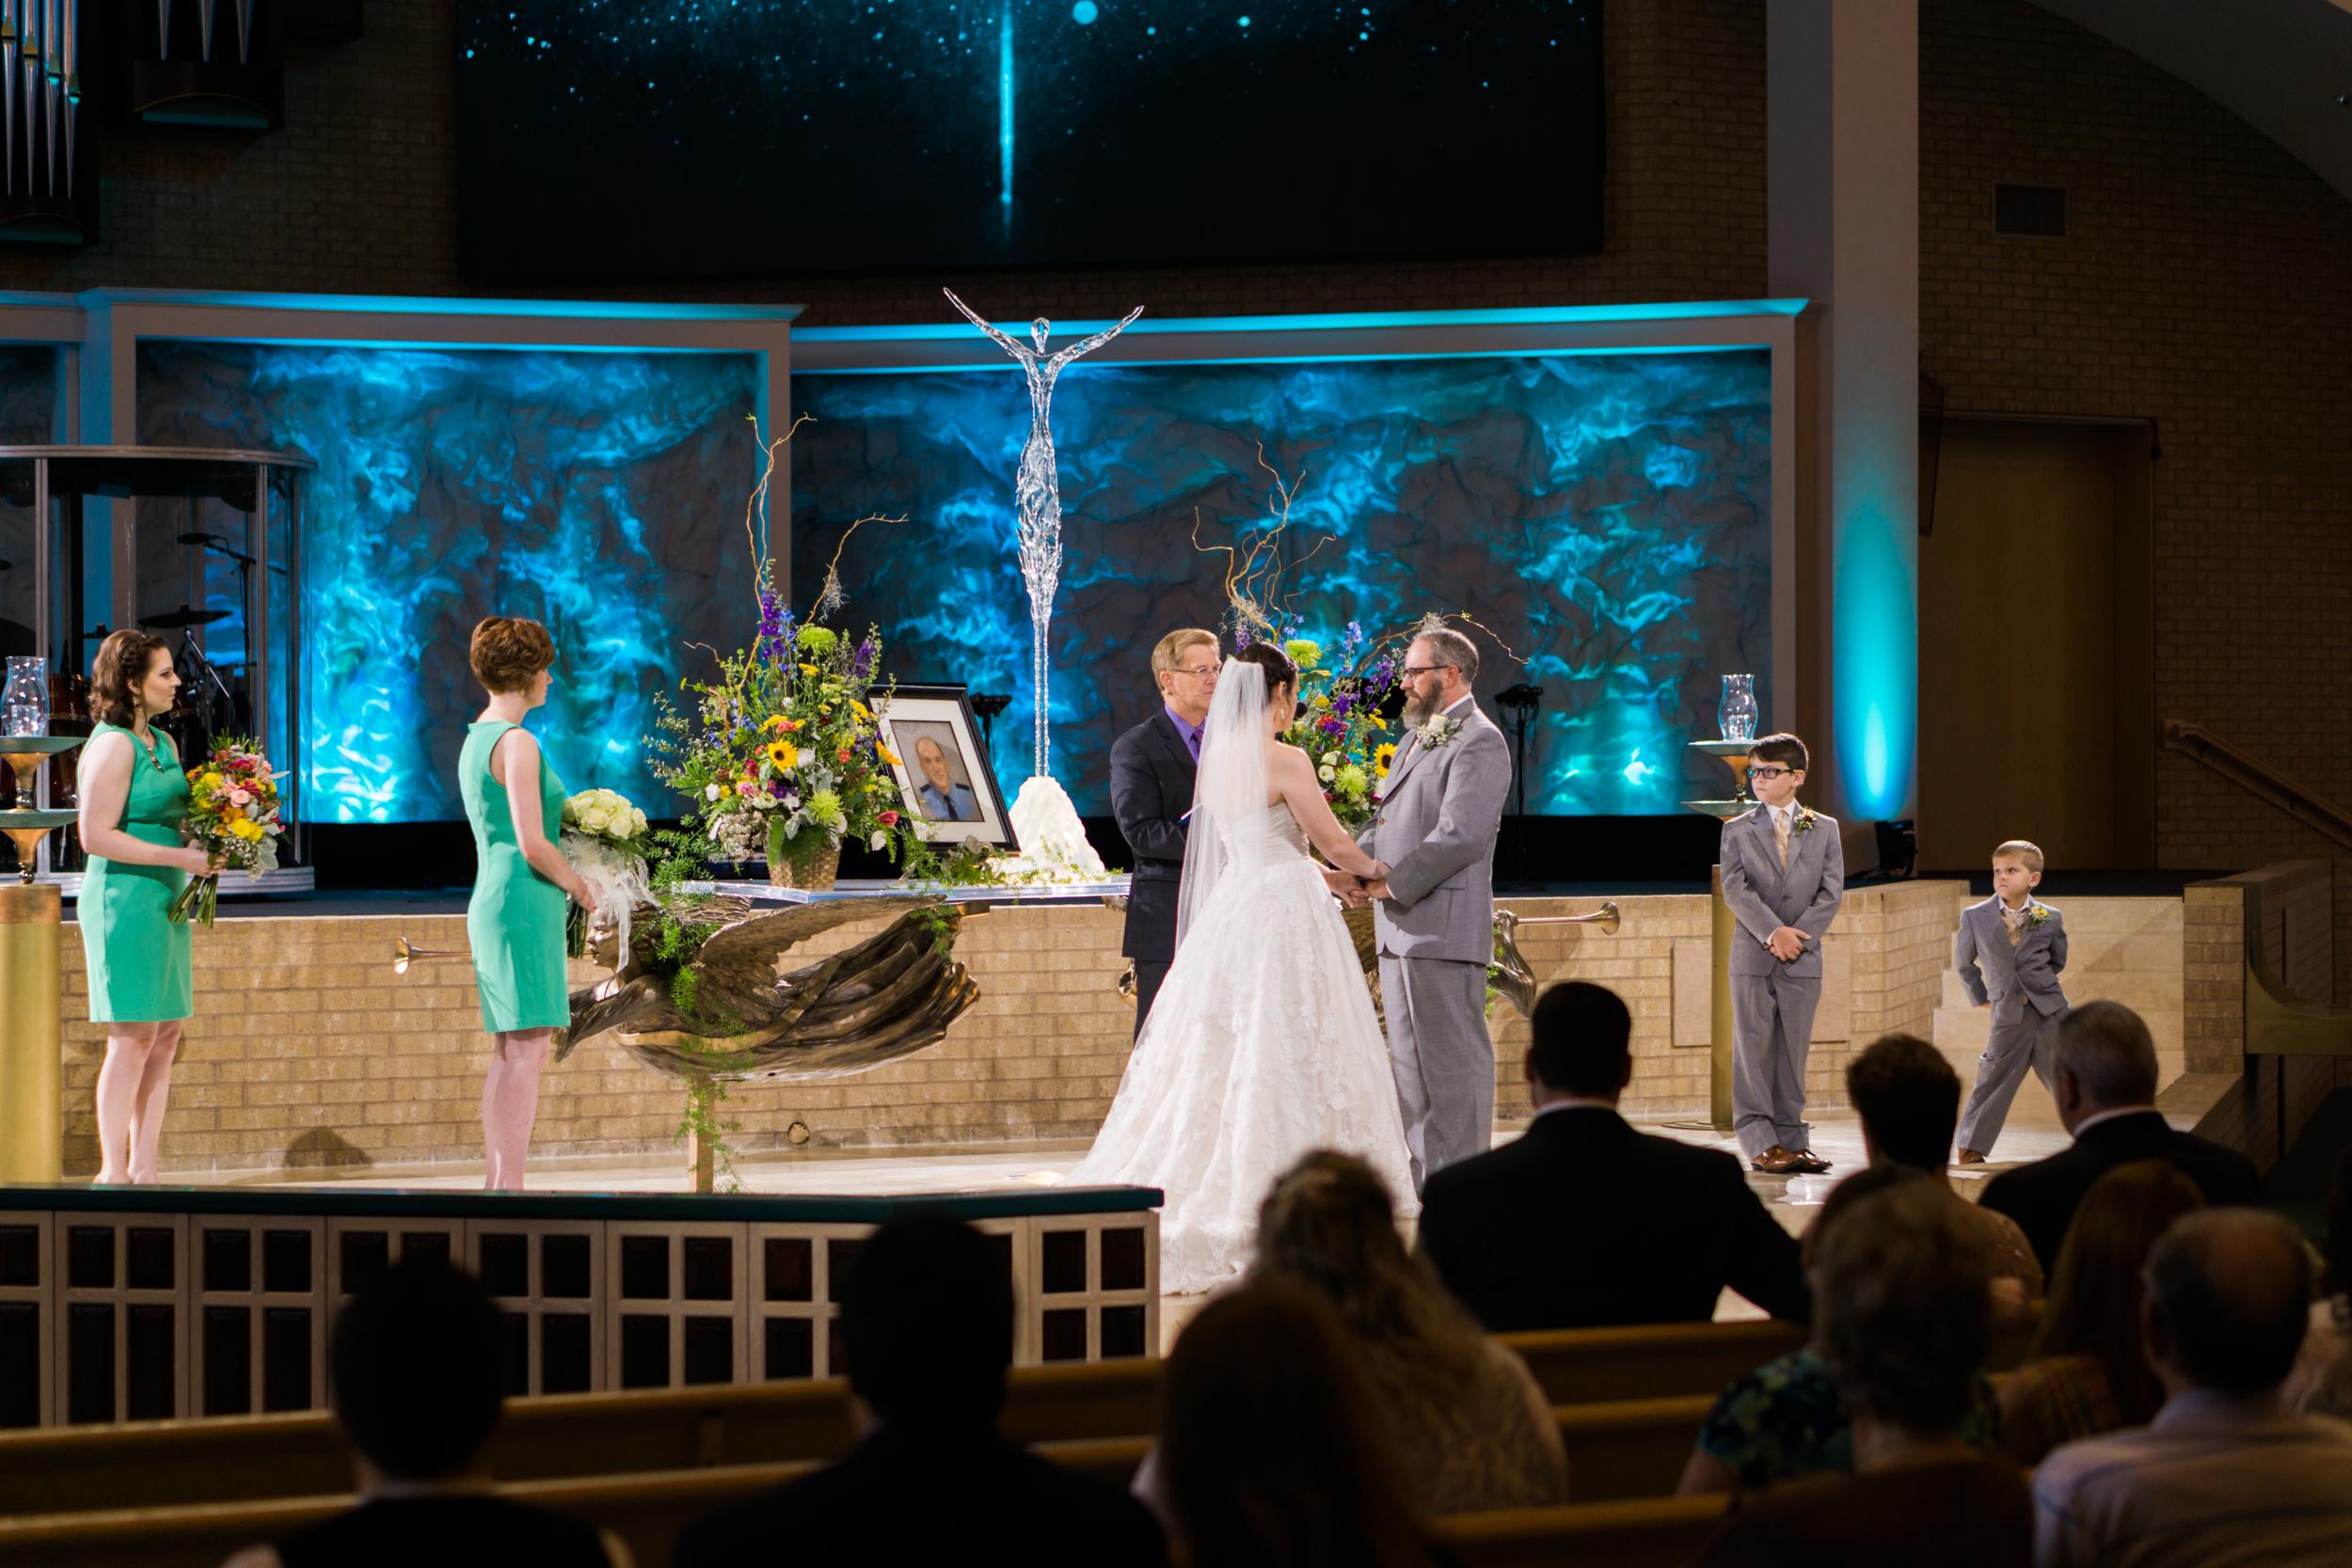 06-04-16_Ramsey_ceremony-3.jpg